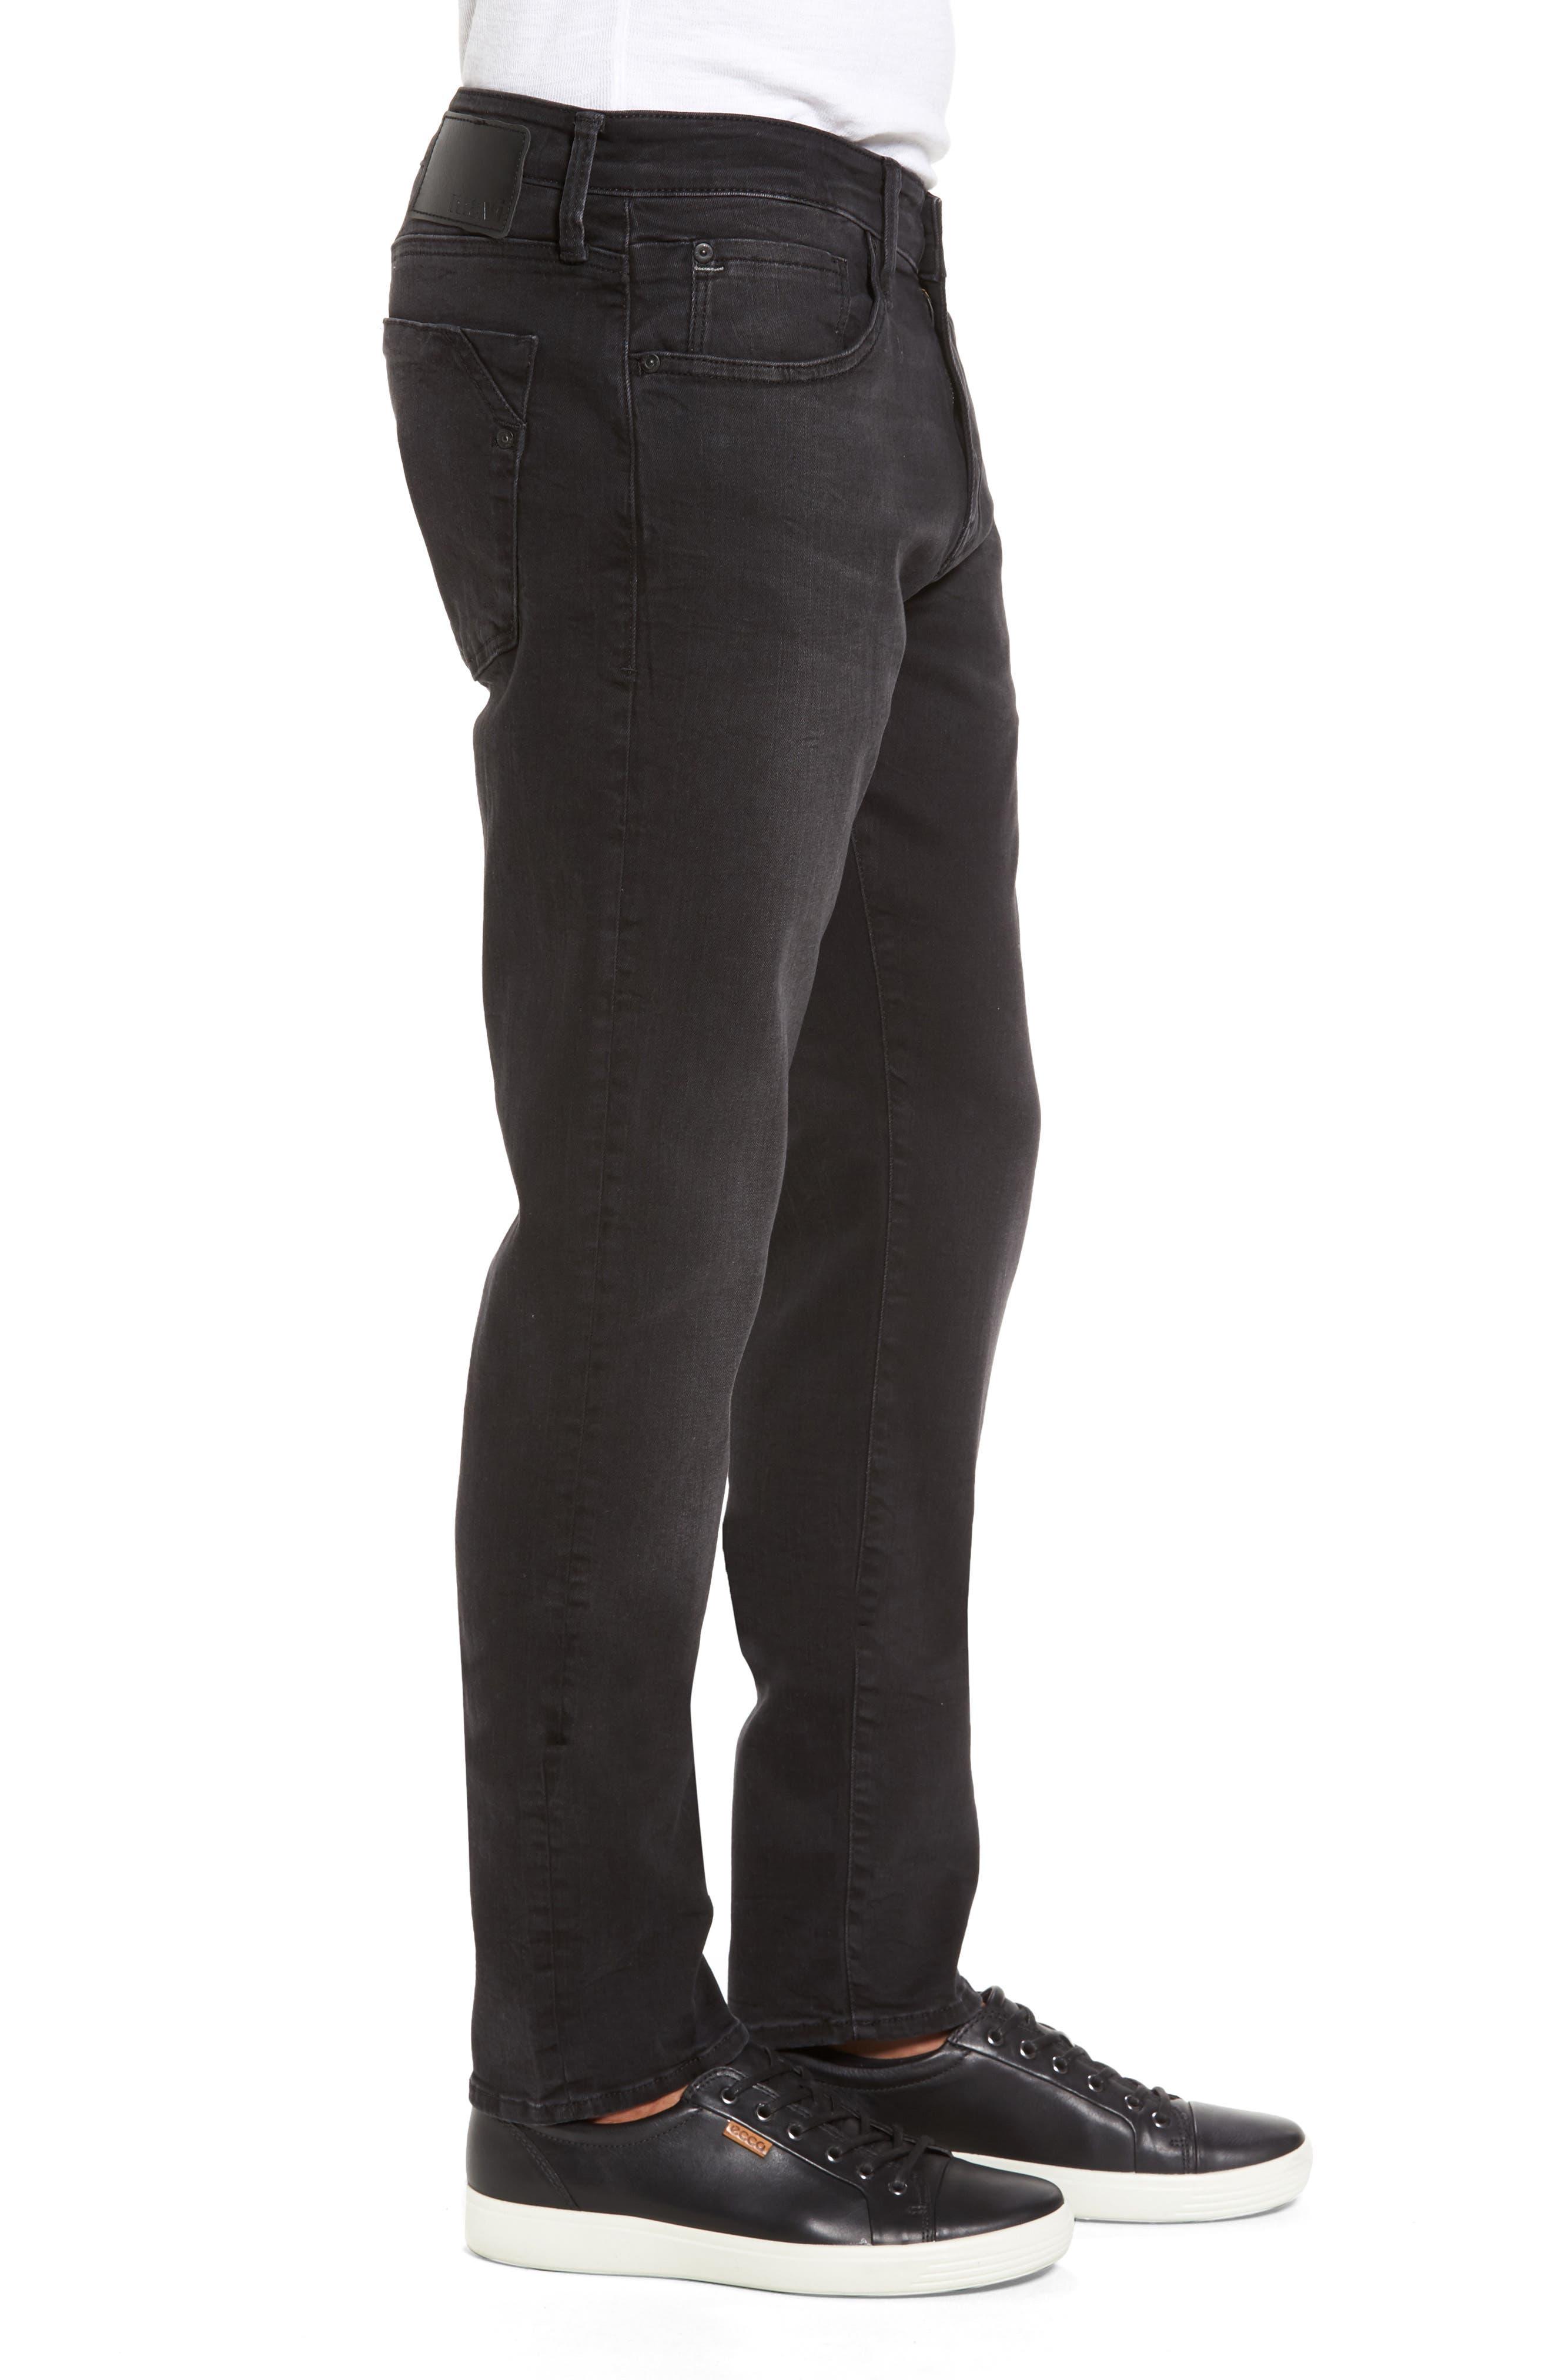 Jake Slim Fit Jeans,                             Alternate thumbnail 3, color,                             020